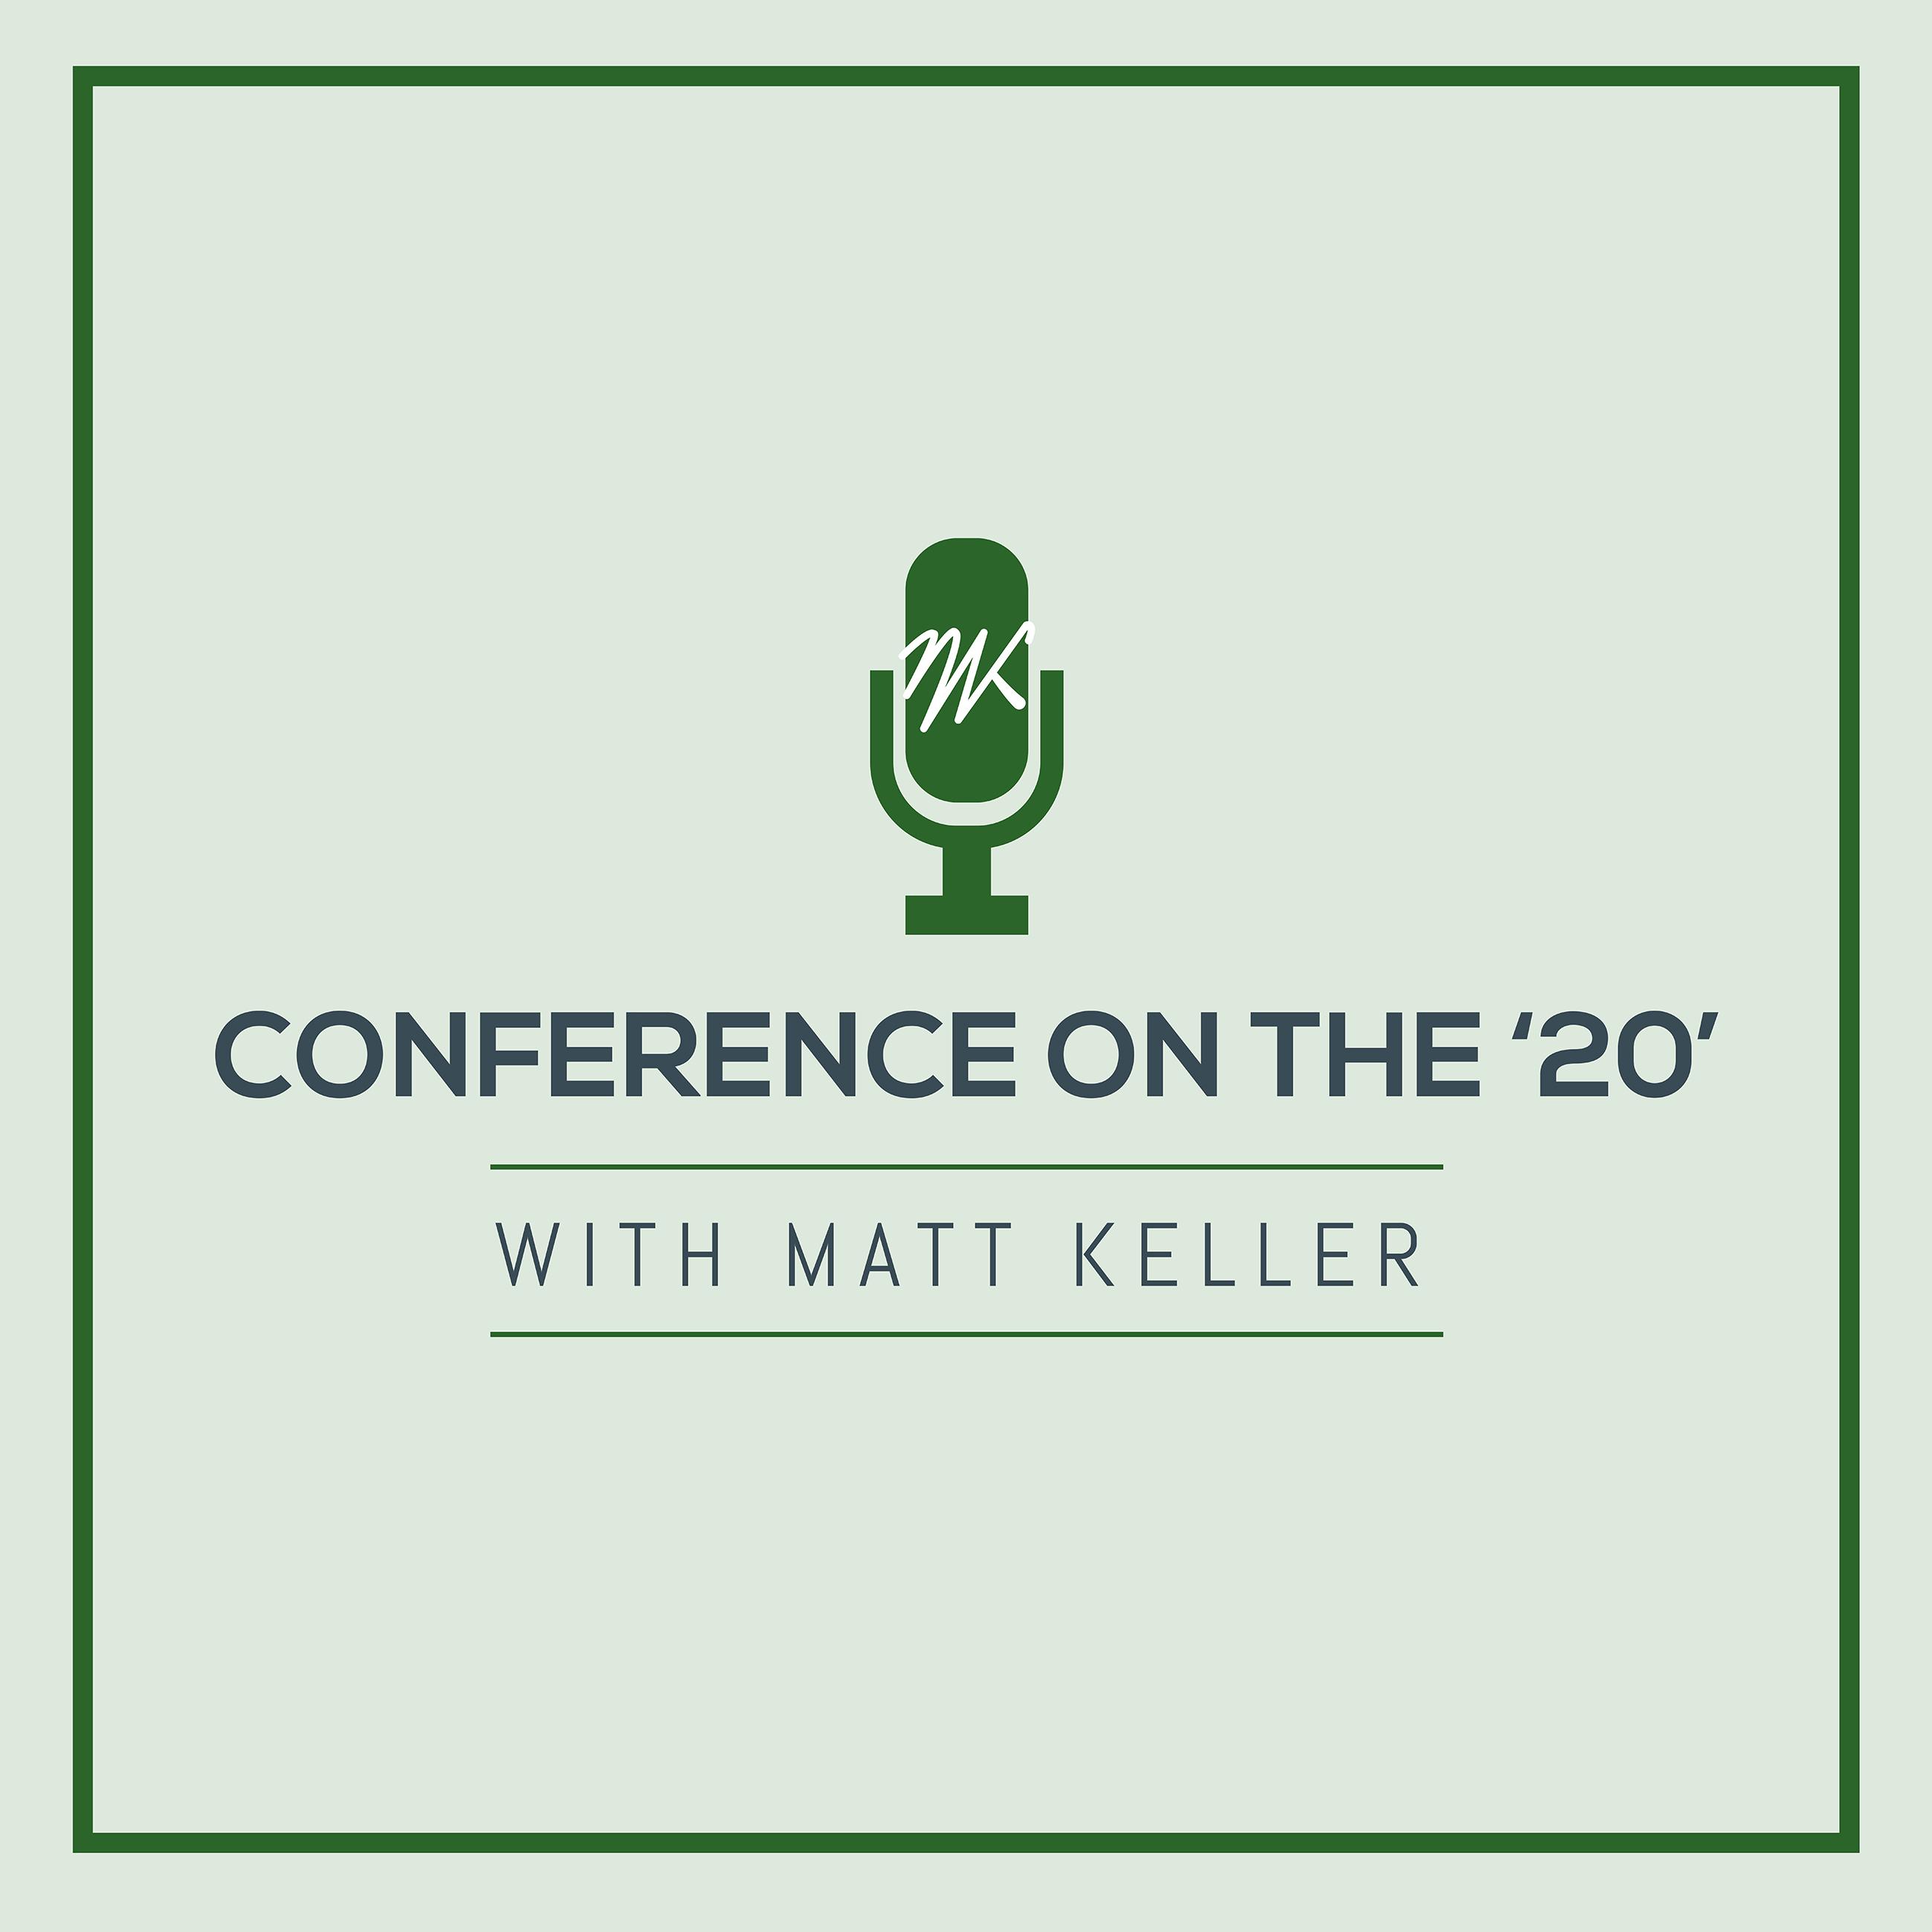 Artwork for Conference on the 20 with Matt Keller